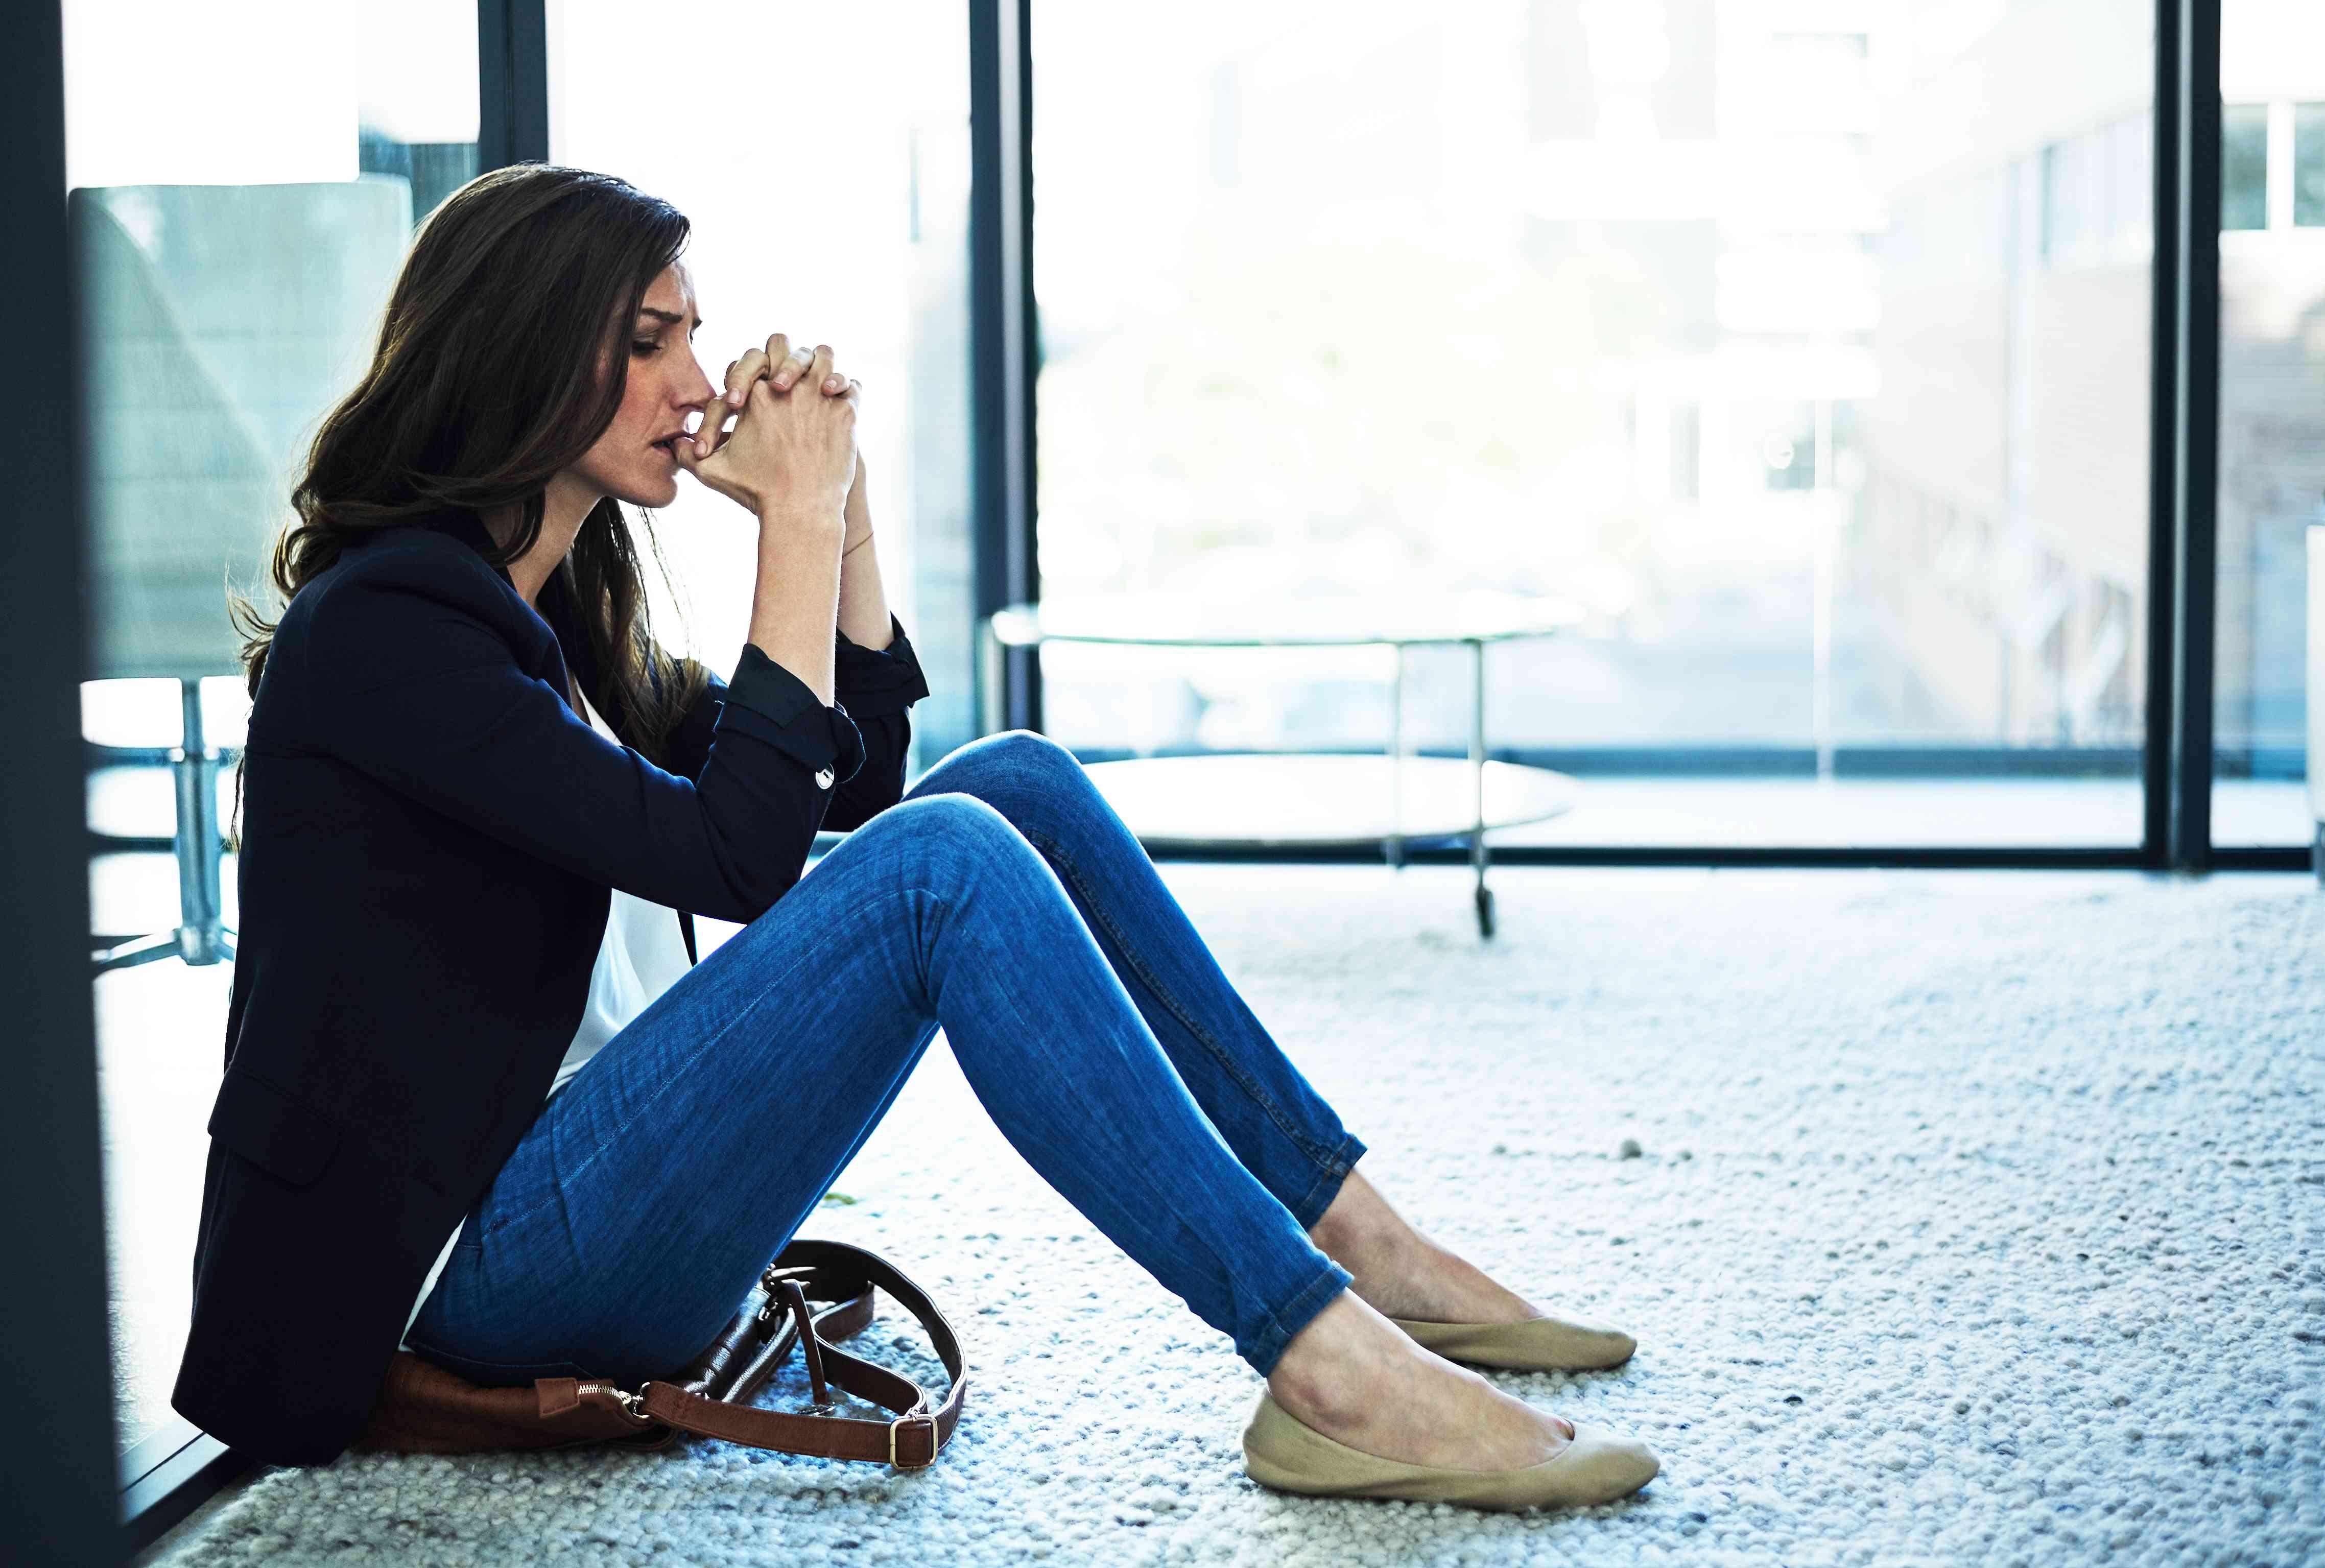 Anxious woman sitting on the floor